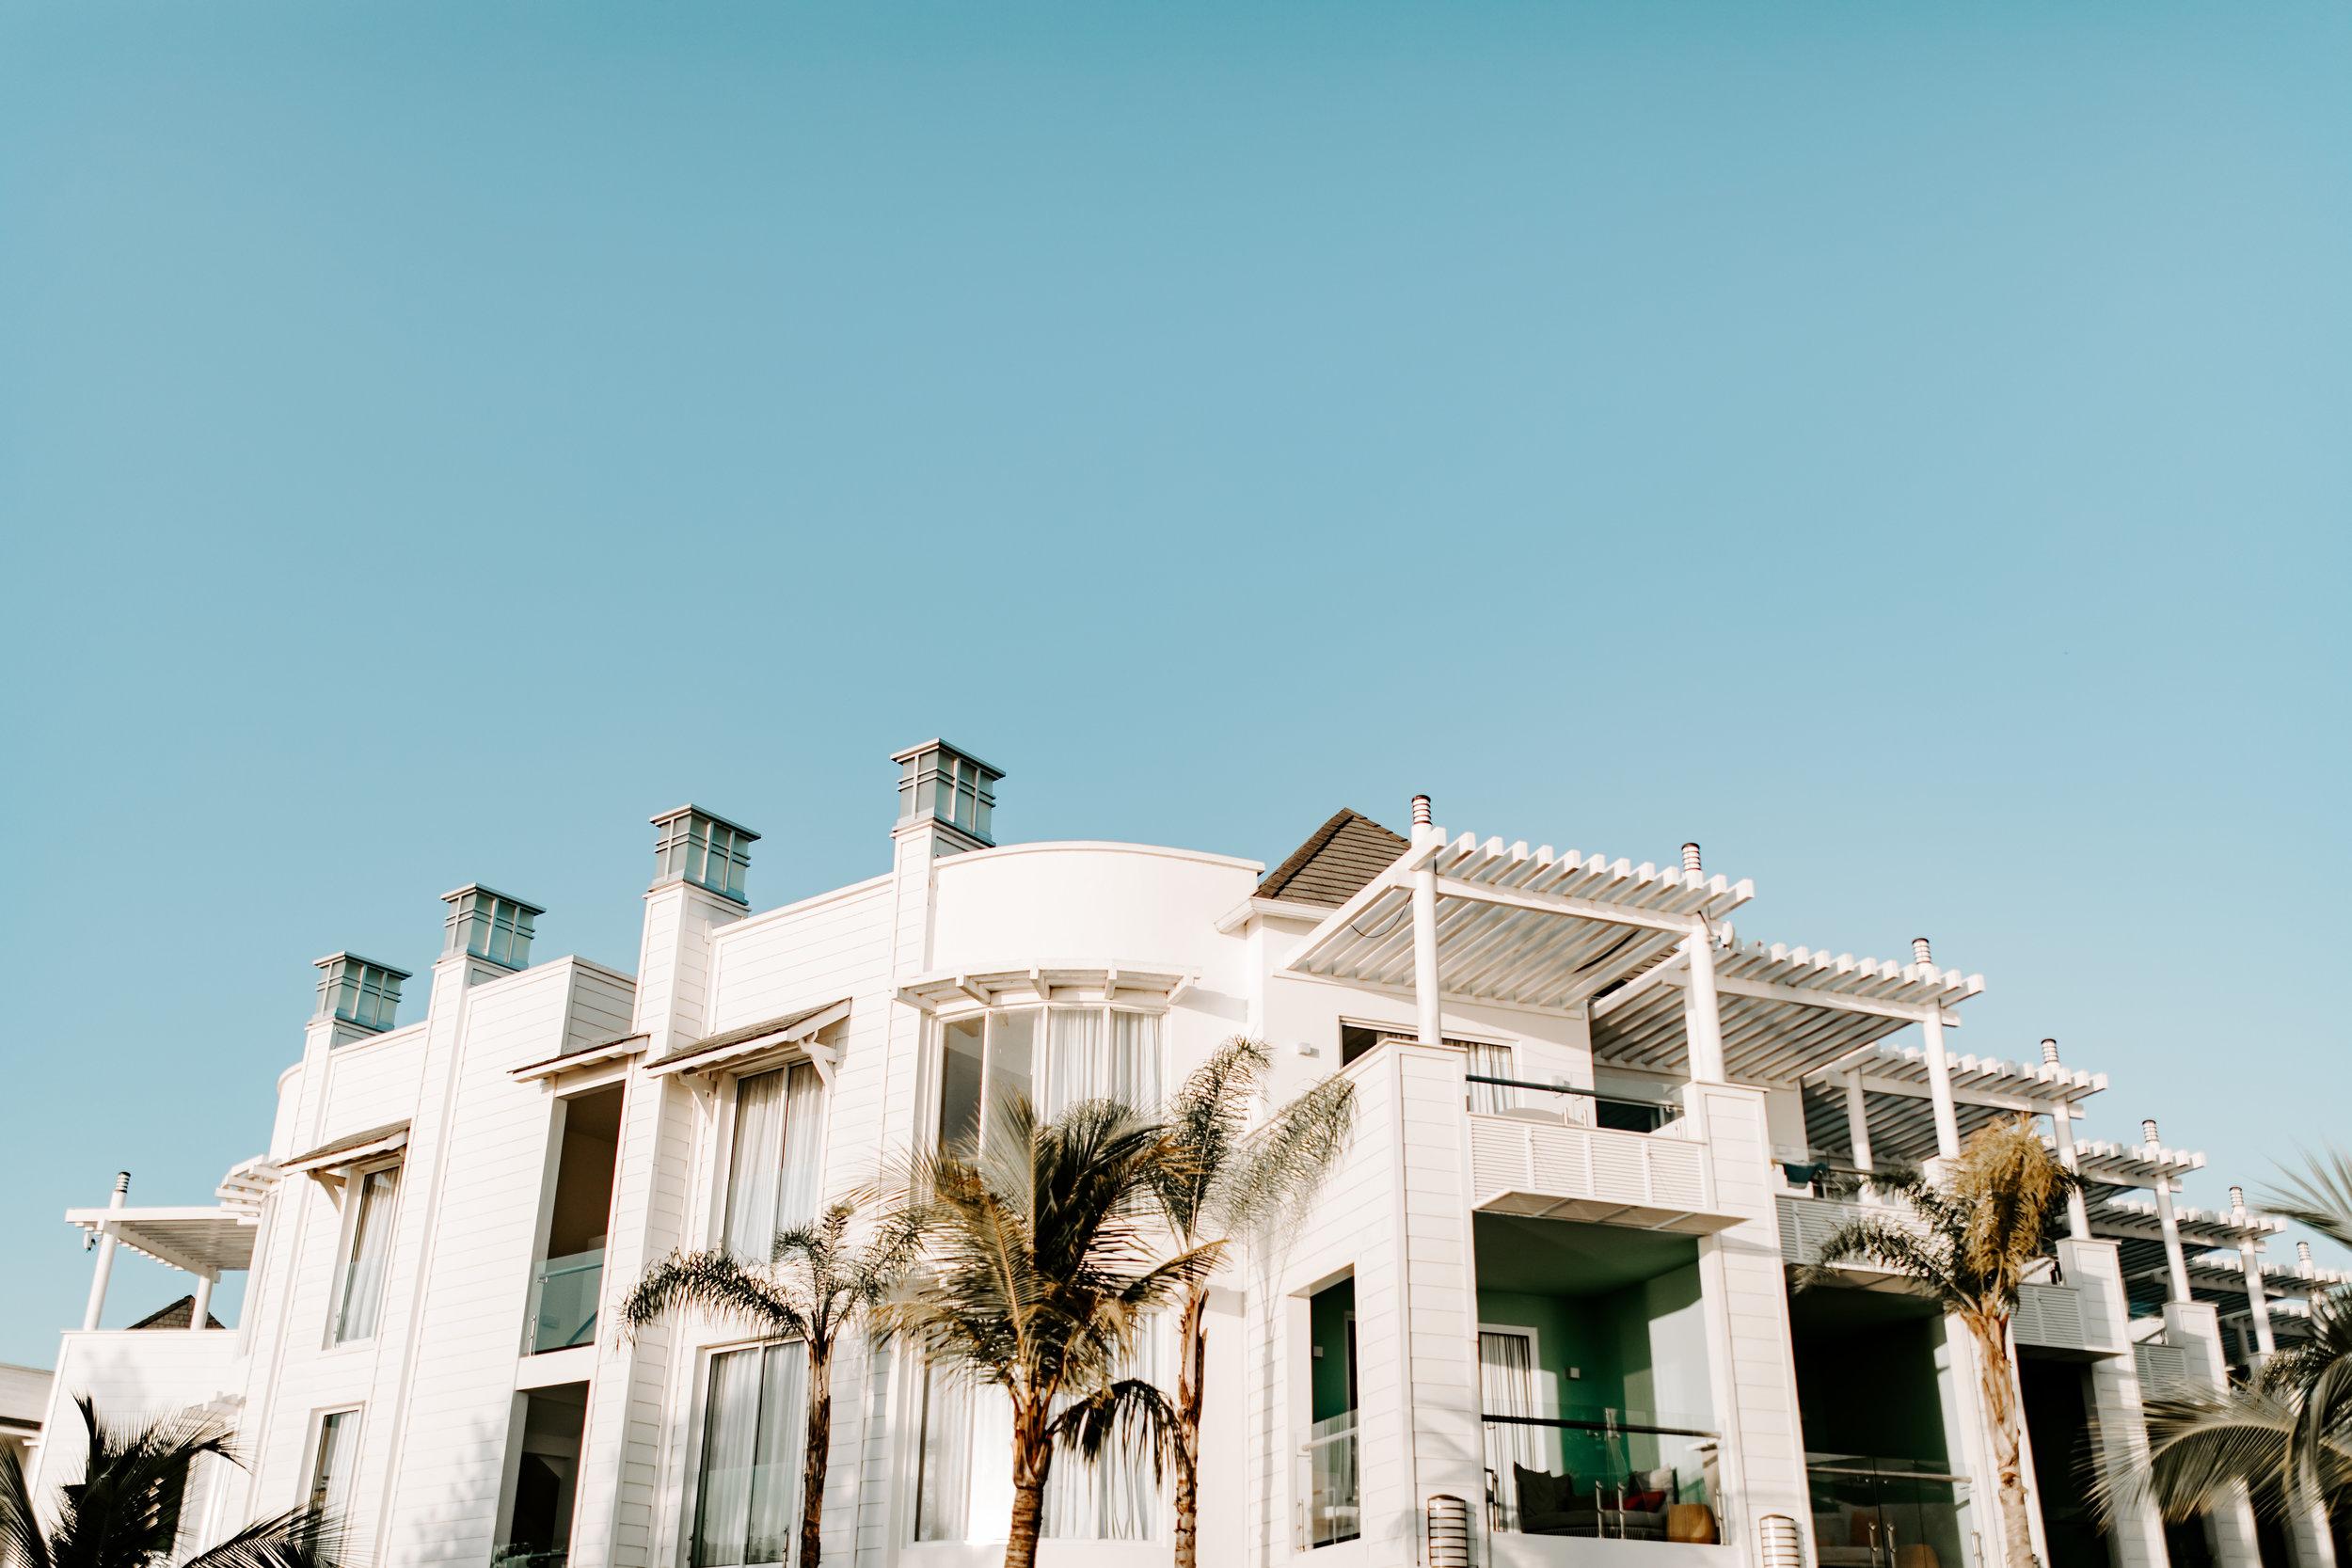 destination wedding, beach wedding, jamaica wedding recap, define fettle, wedding day, jamaican wedding